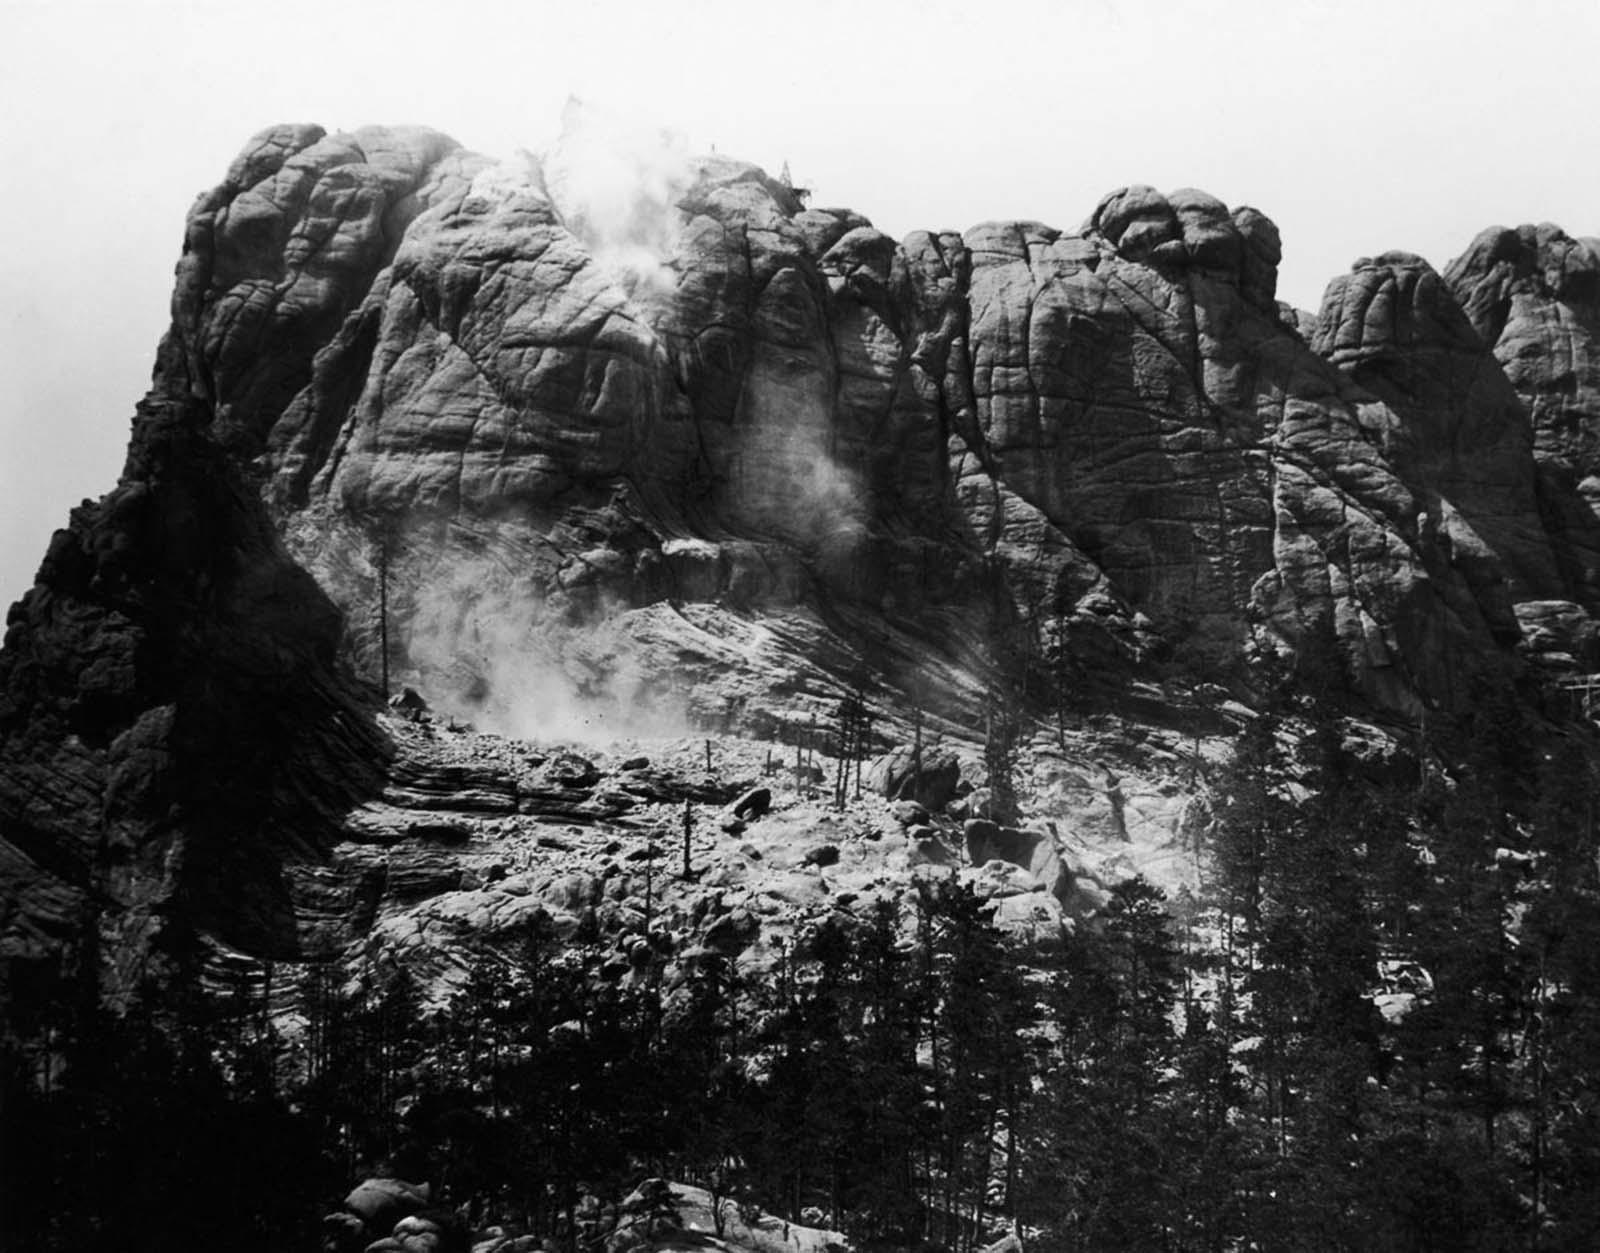 Mount Rushmore getting blasted. 1927.